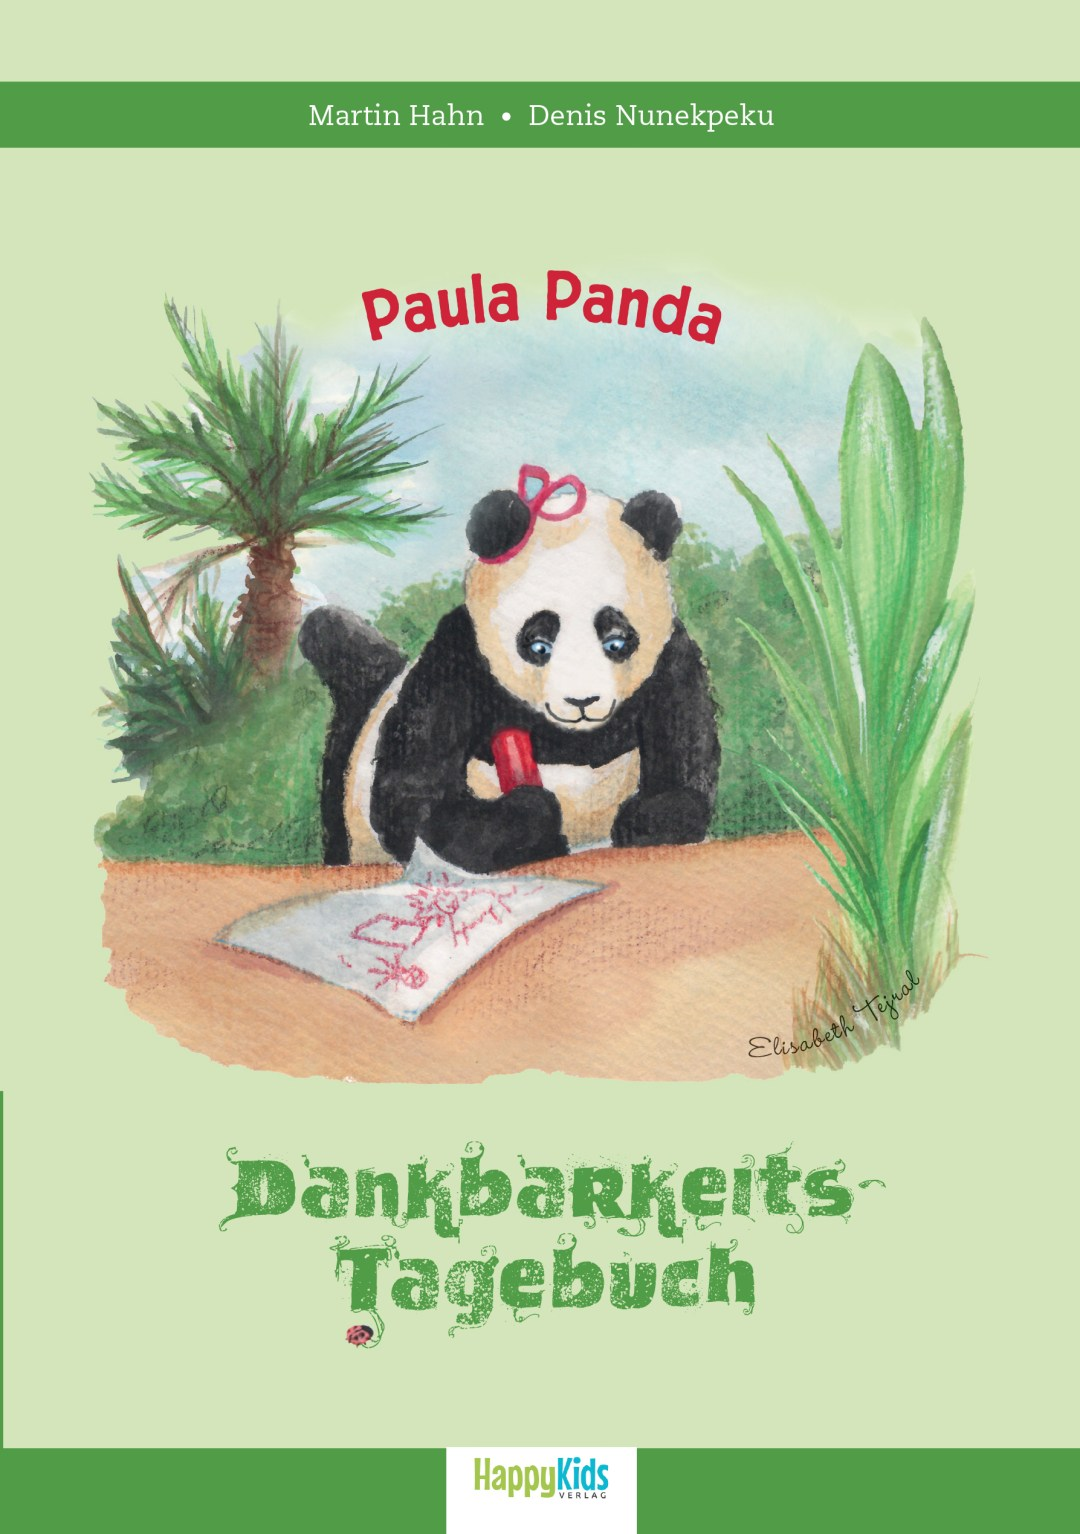 Cover - PaulaPanda - Der Bambus-Zauberstab ©Elisabeth_Tejral -www.PaulaPanda.org - honorarfrei (1.4MB, JPG)